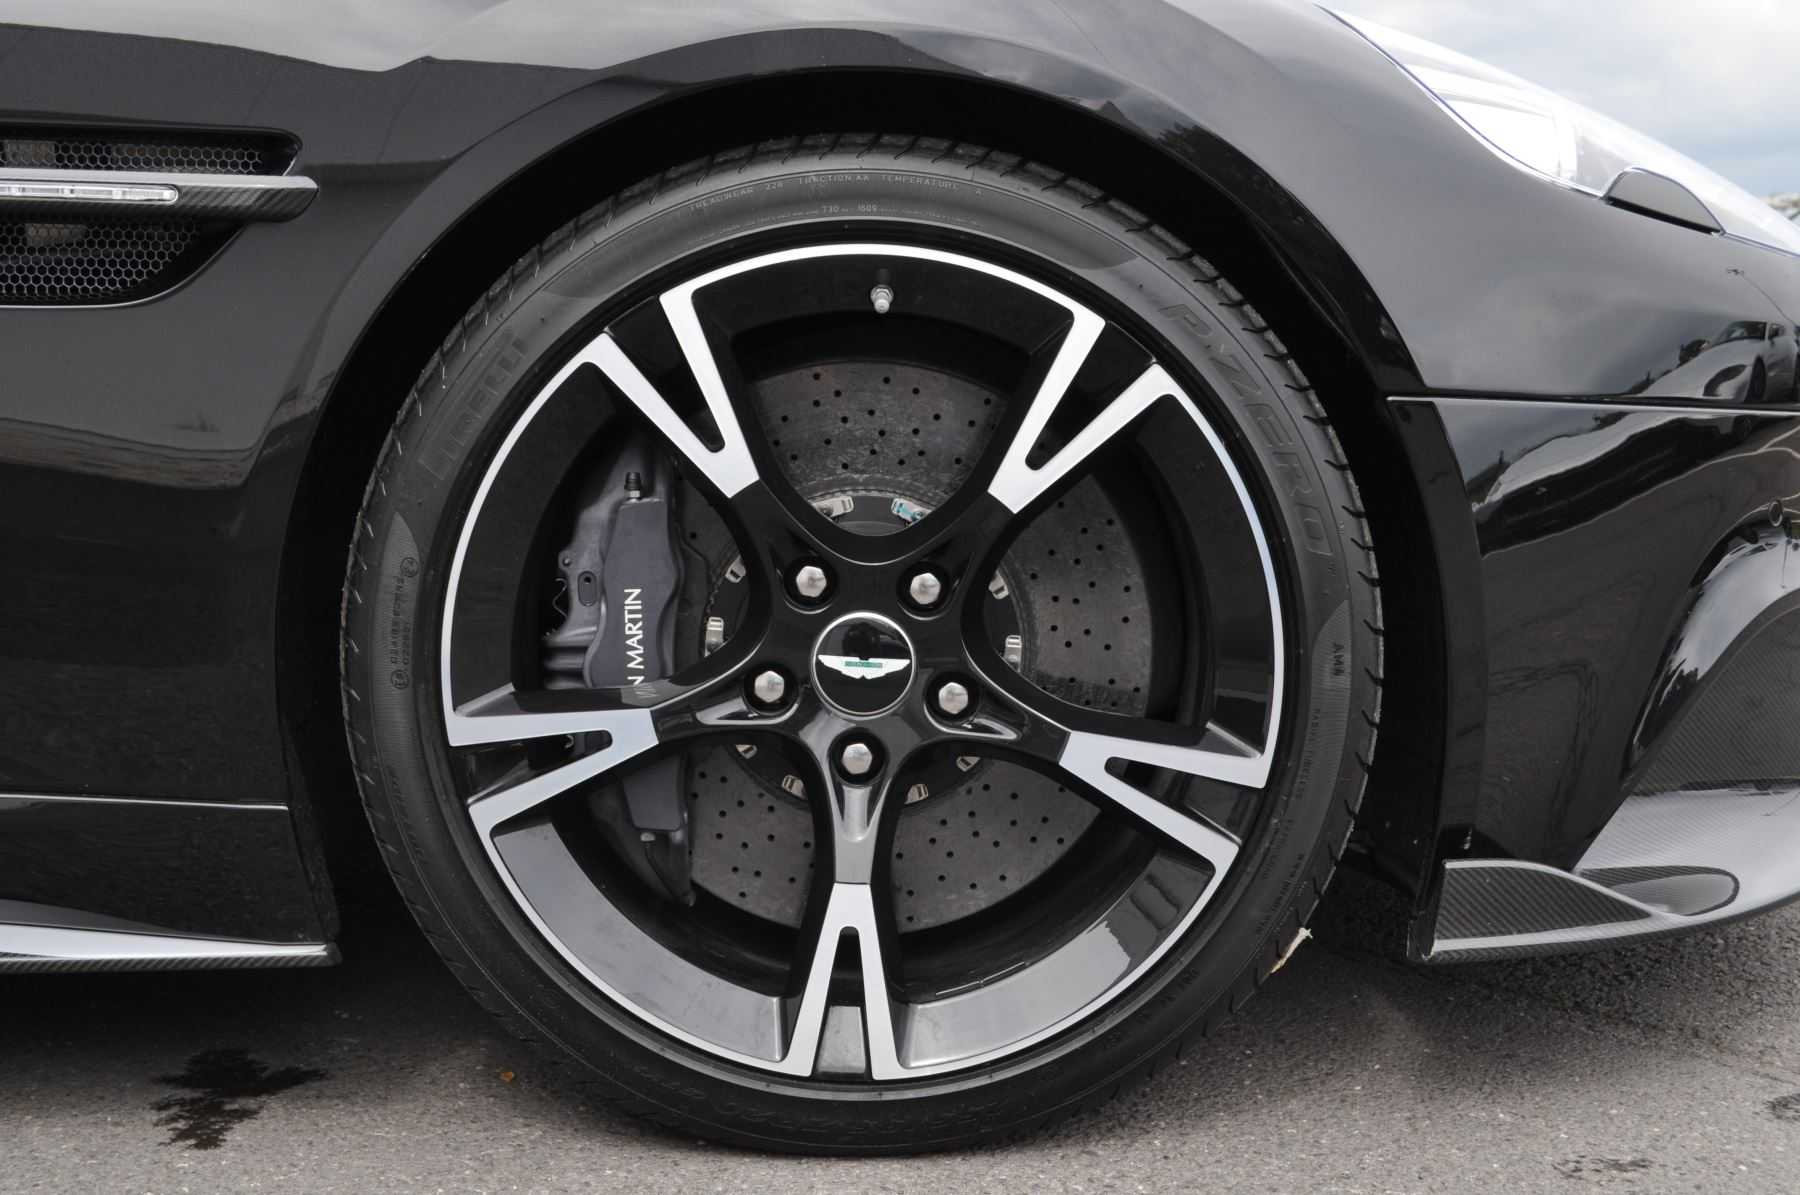 Aston Martin Vanquish S V12 [595] S 2+2 2dr Touchtronic image 47